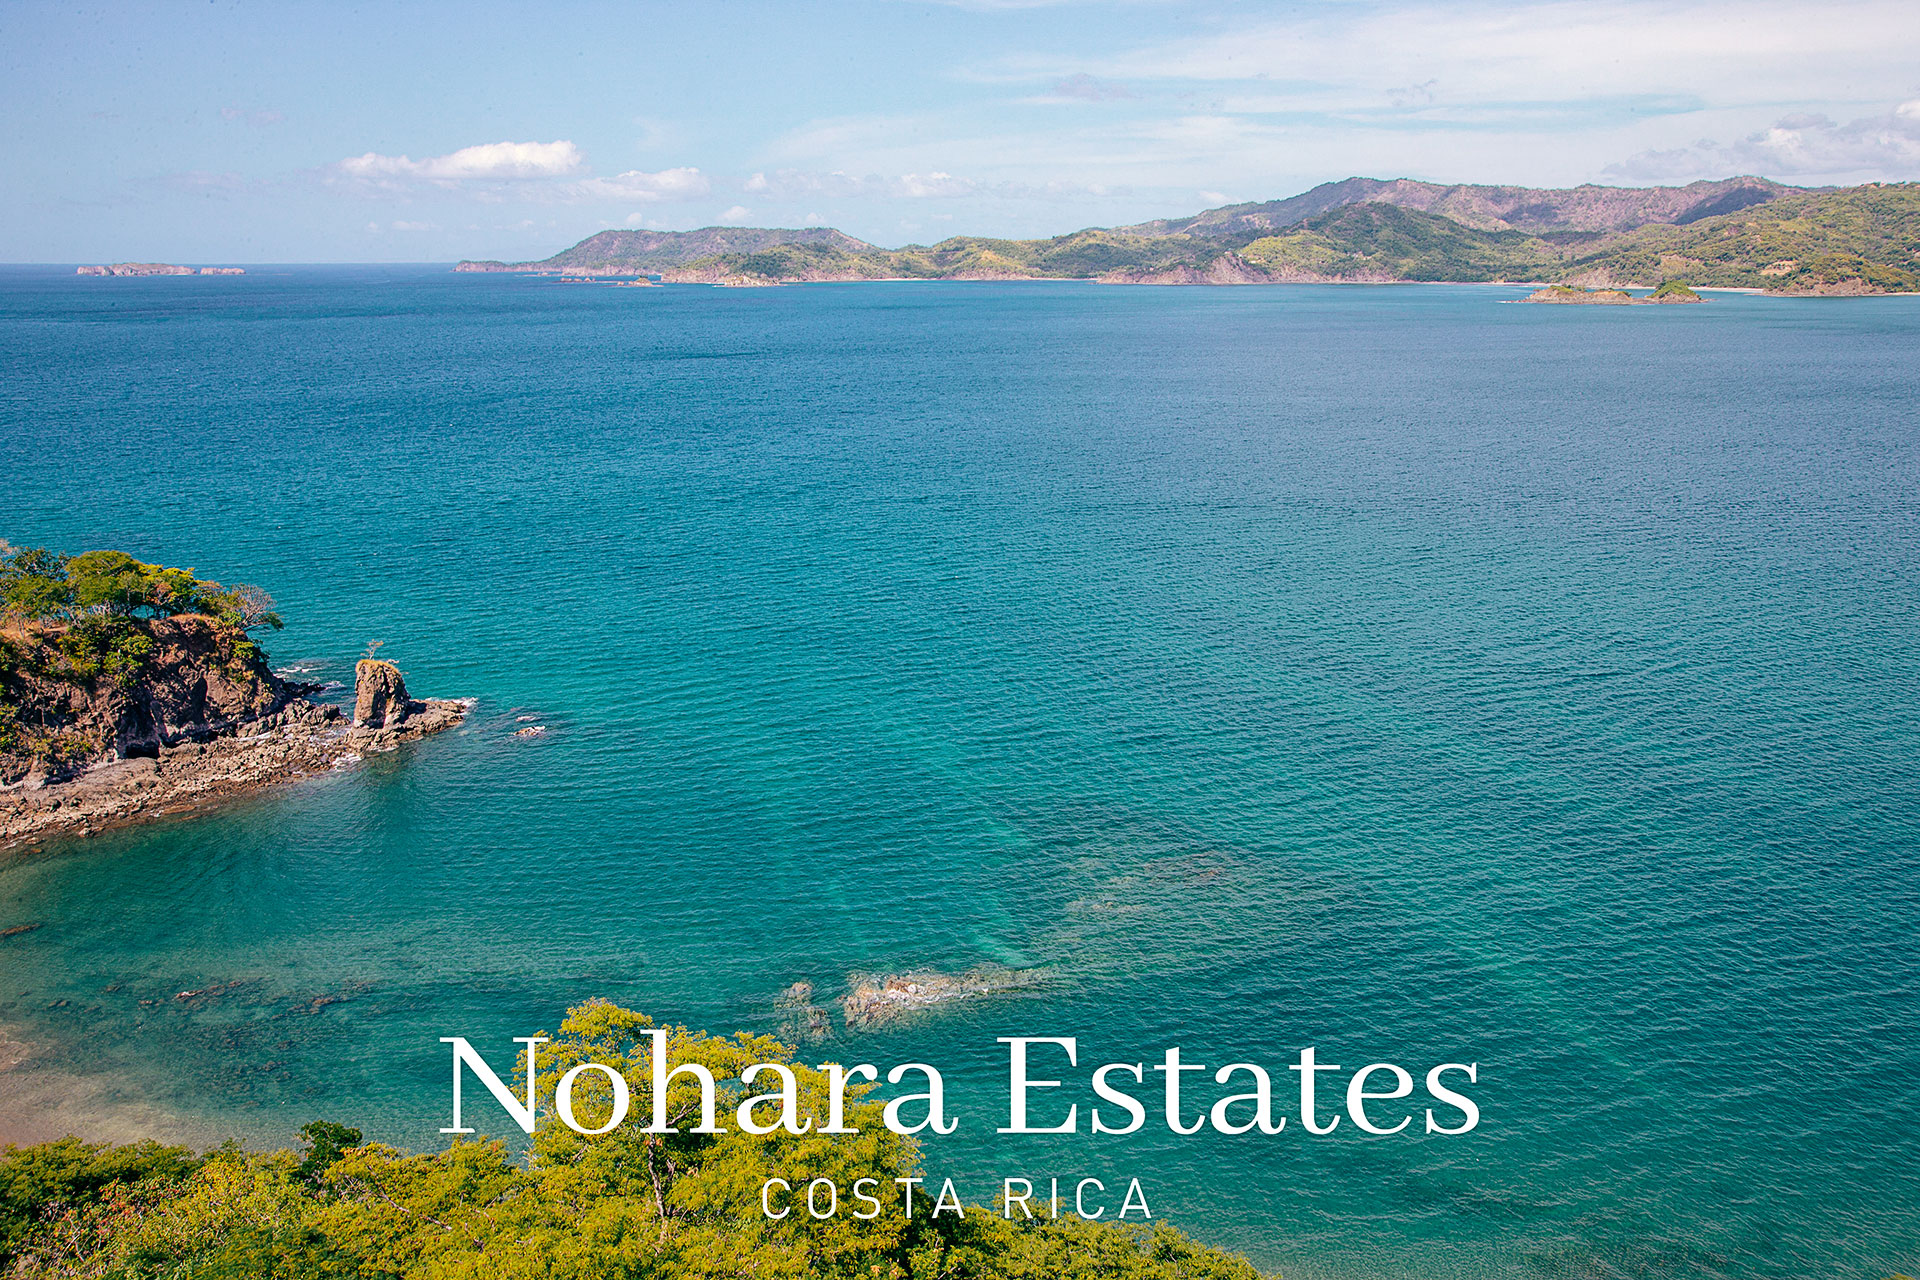 Nohara Estates Costa Rica 360 Esplendor Del Pacifico Area 24